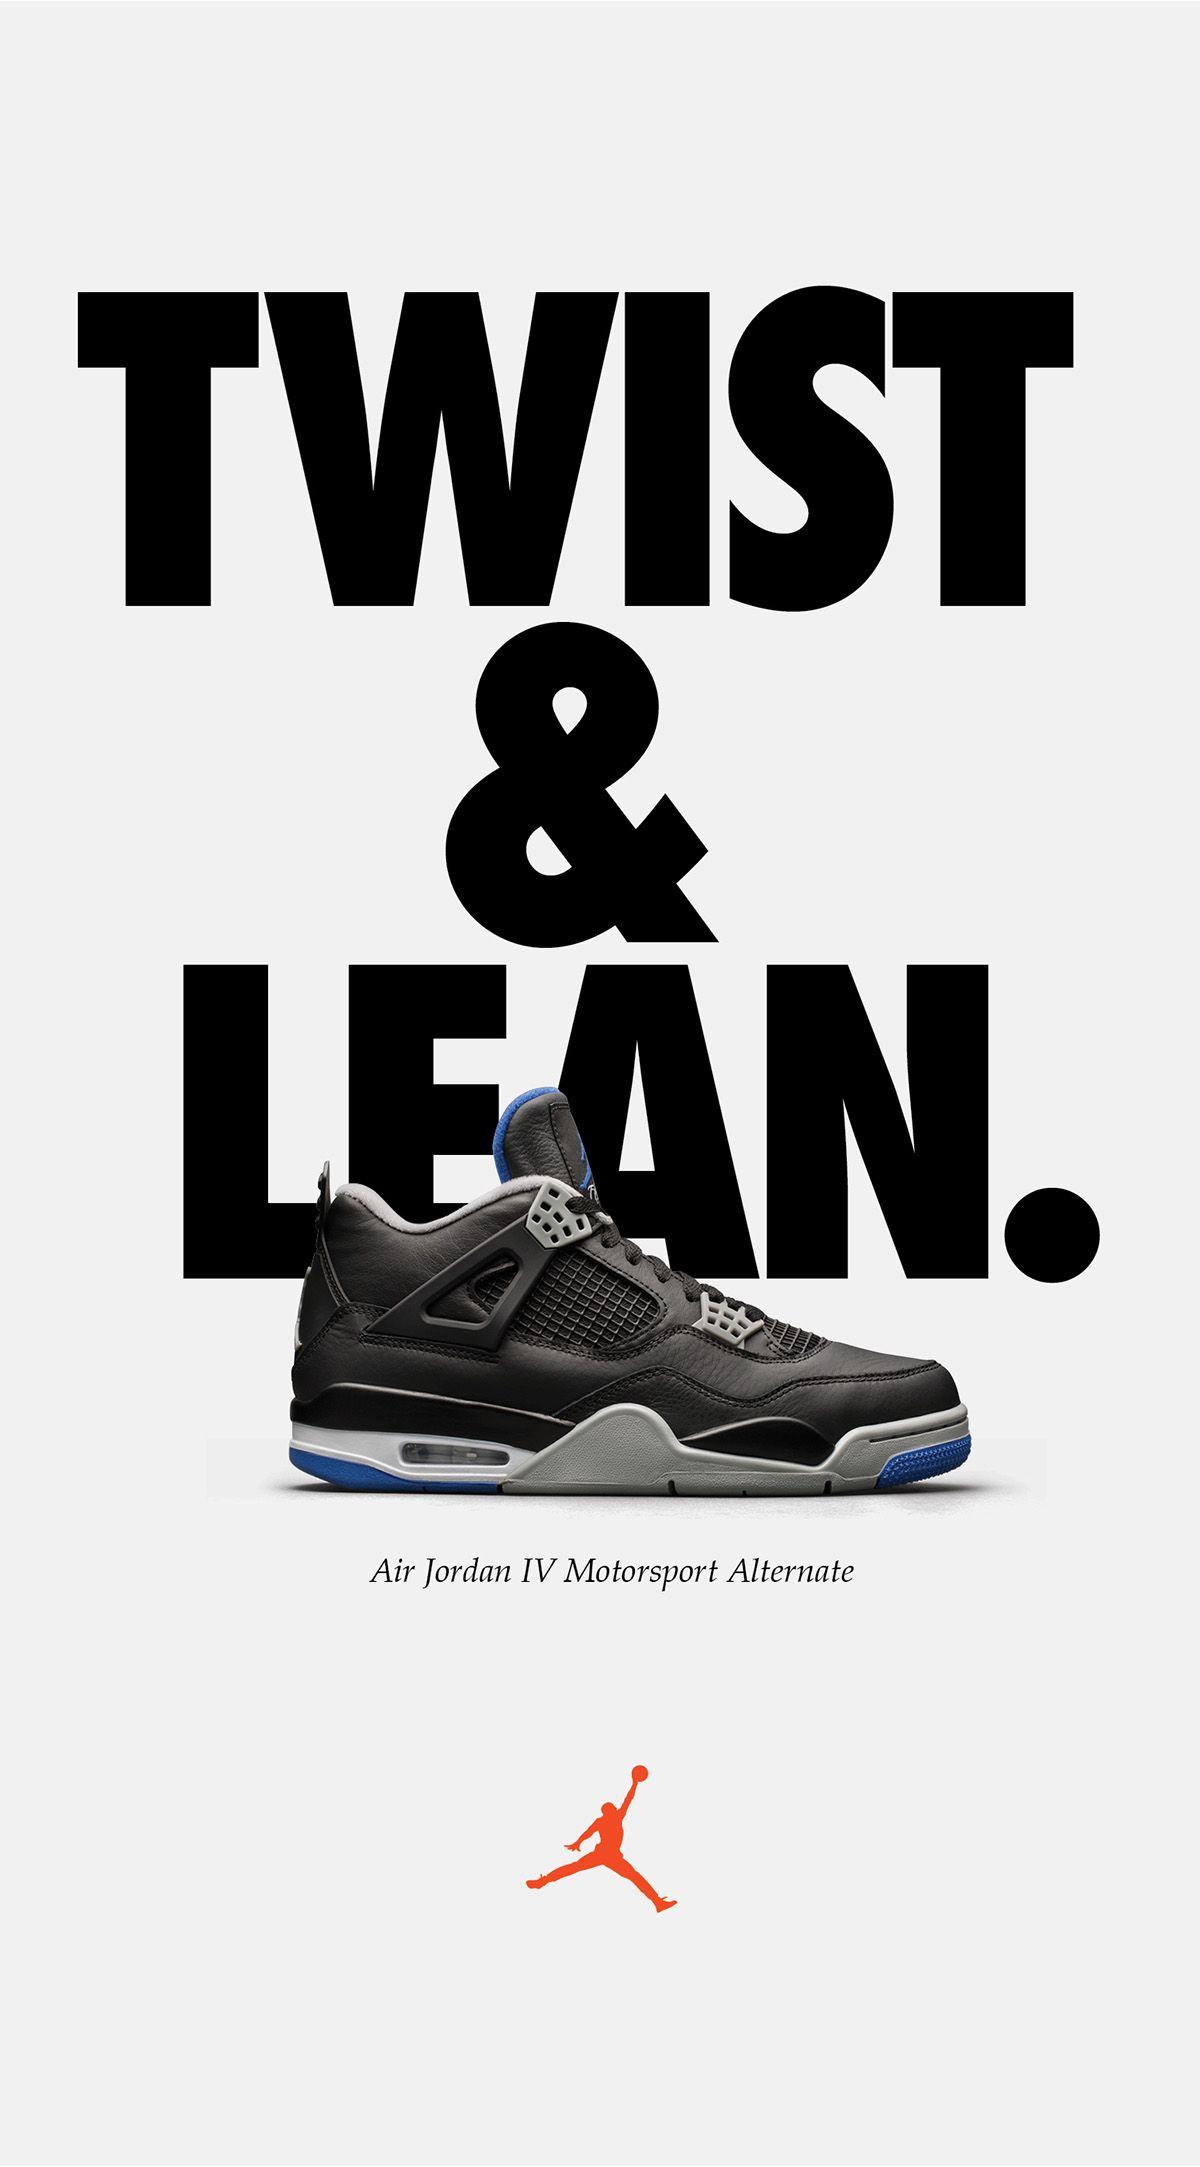 Preview  Air Jordan 4 Retro  Alternate Motorsport  - EU Kicks  Sneaker  Magazine a9a1b0ed8